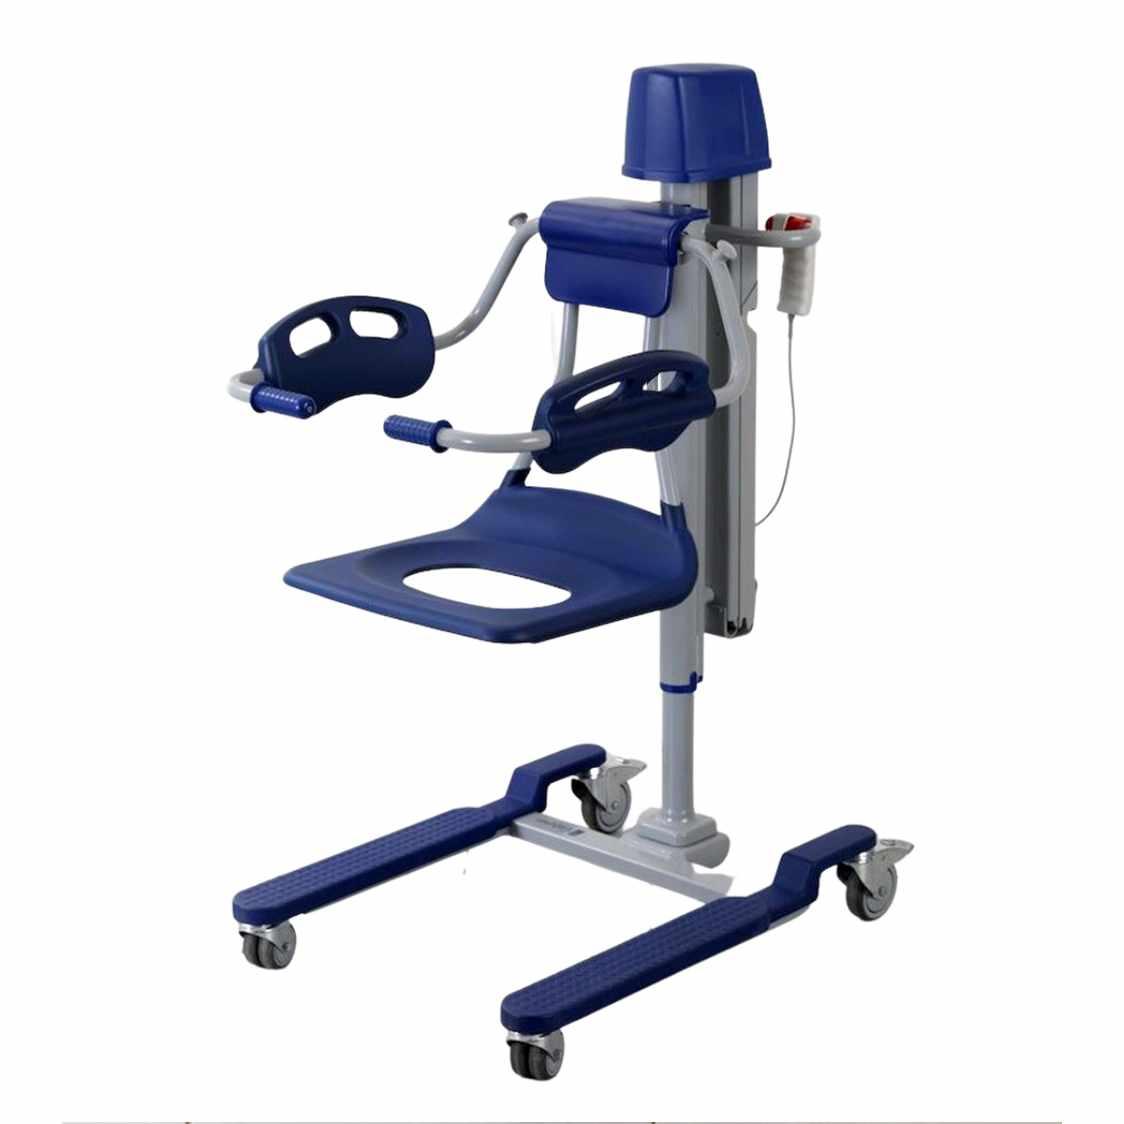 Arjo Calypso bath lift chair